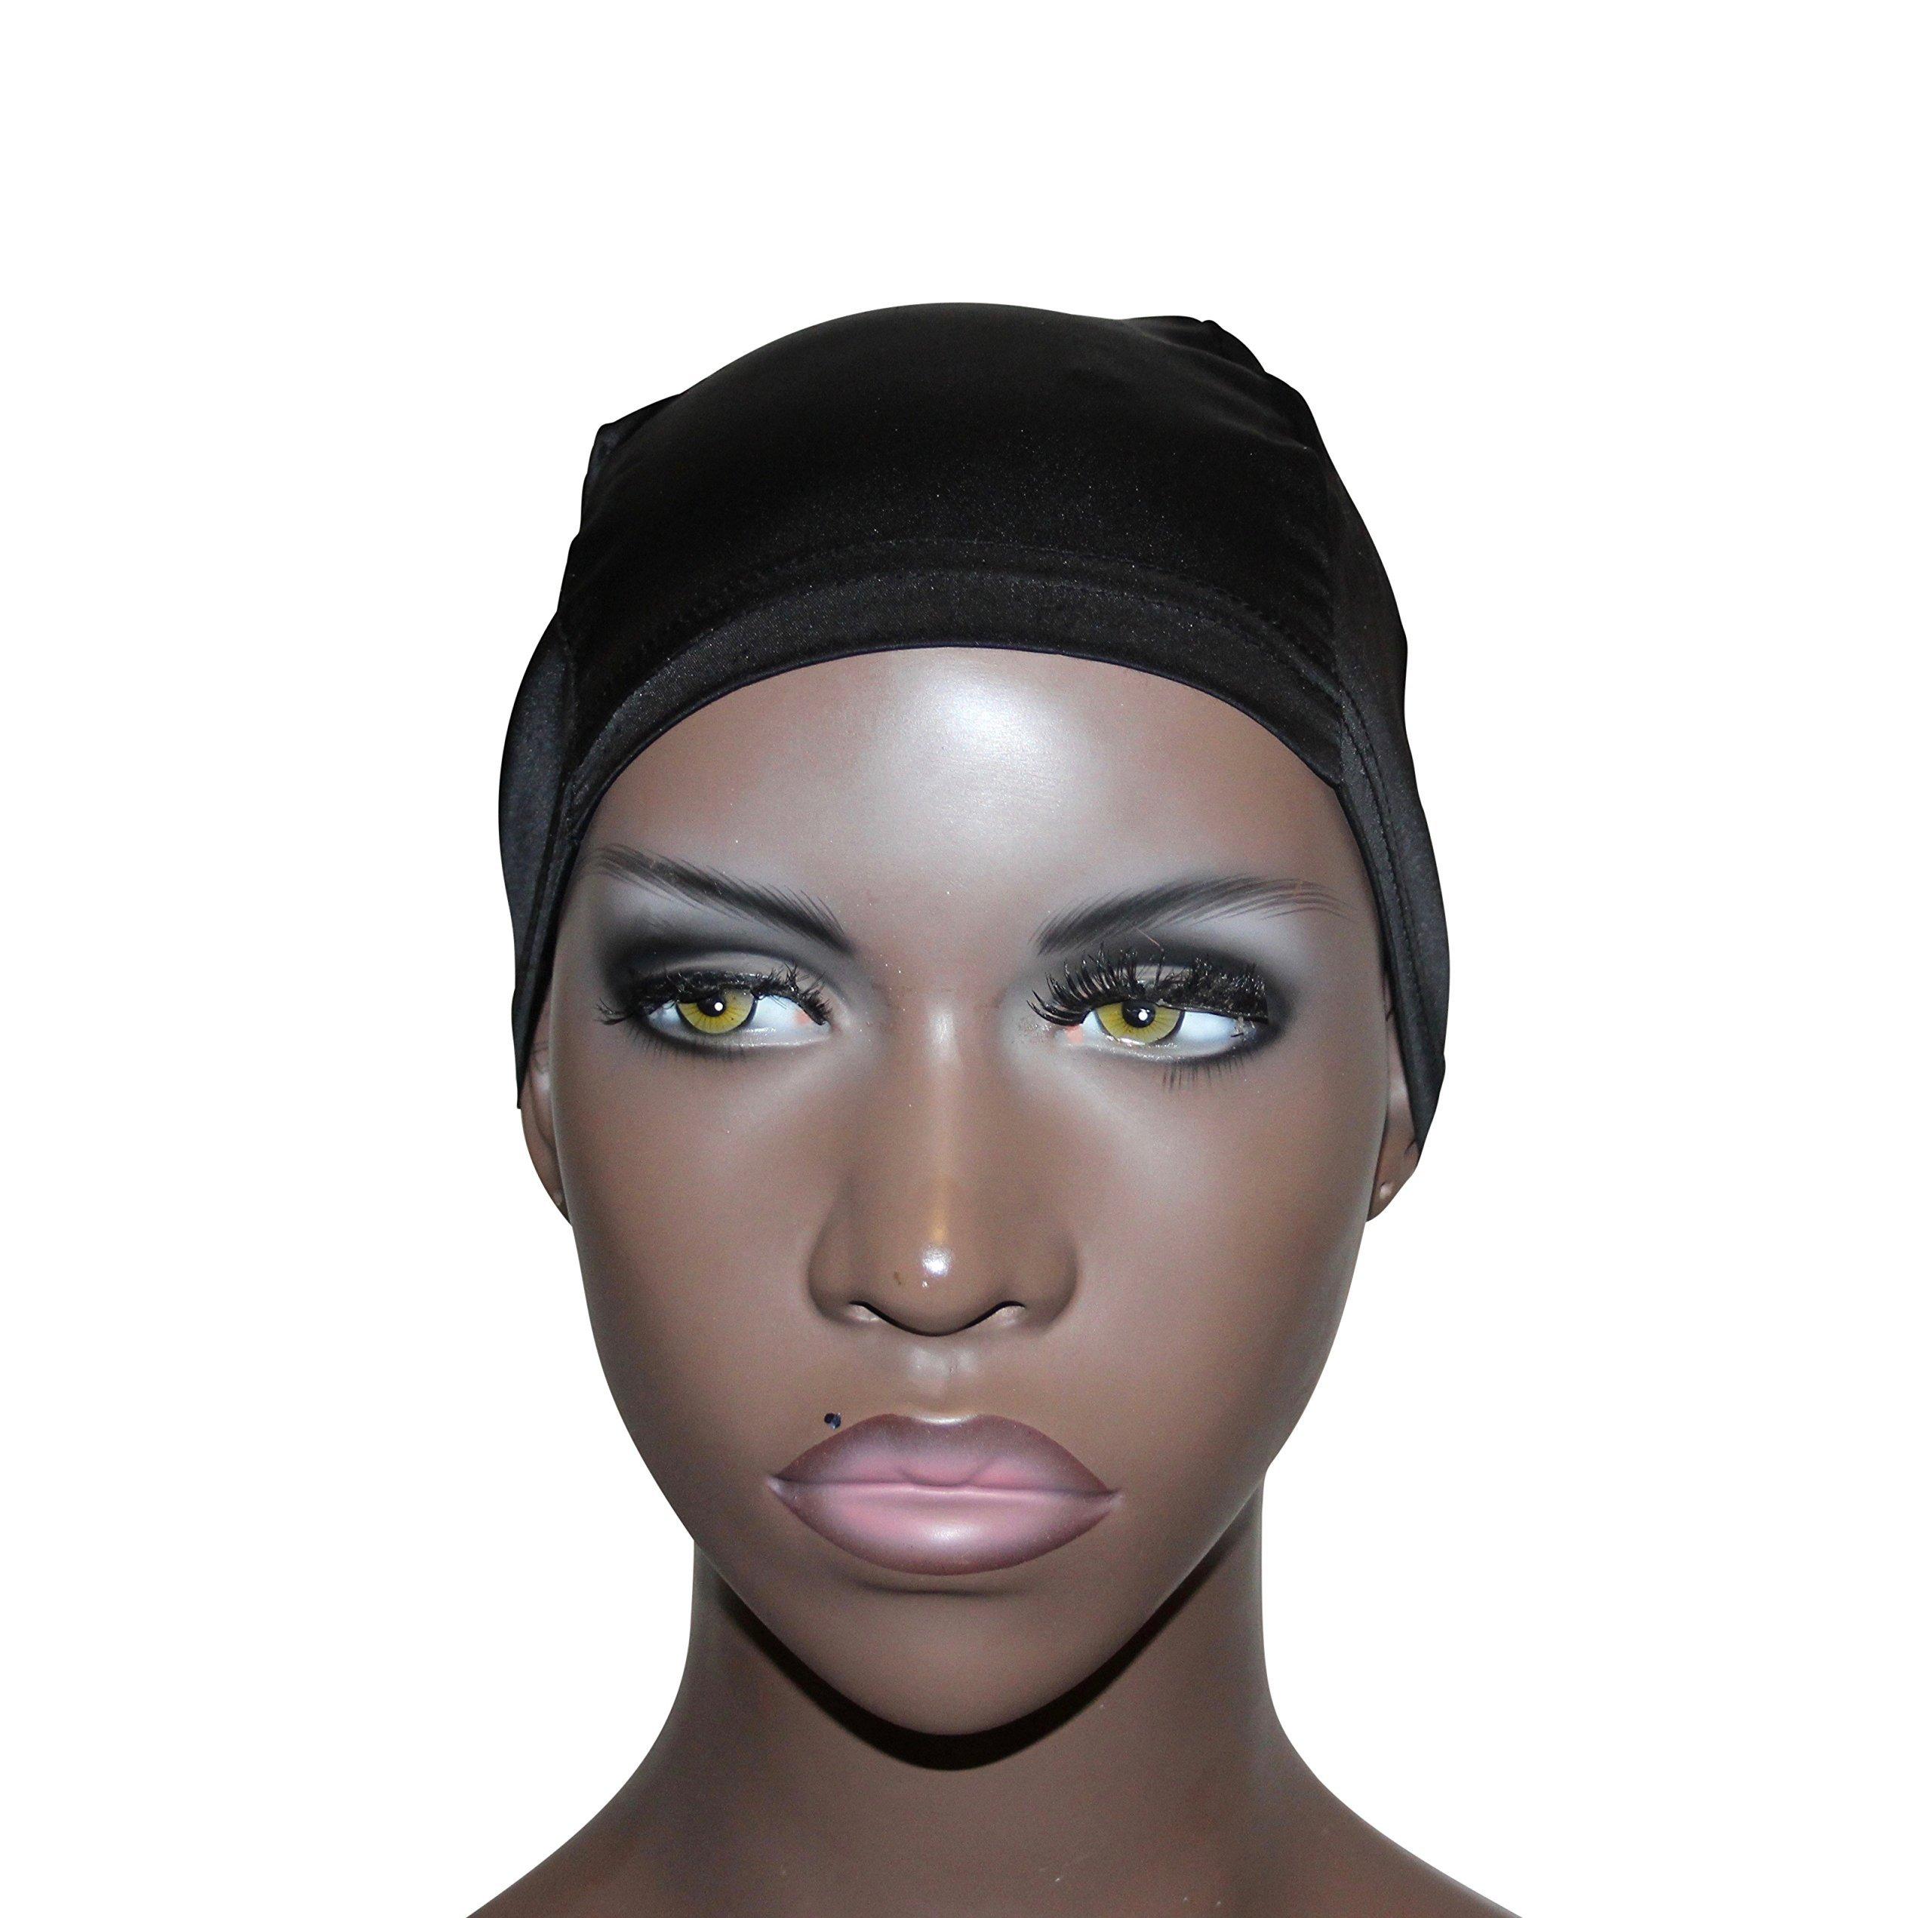 Smoothie Cap 100% Silk Wig Cap (Black) by Smoothie Cap (Image #1)